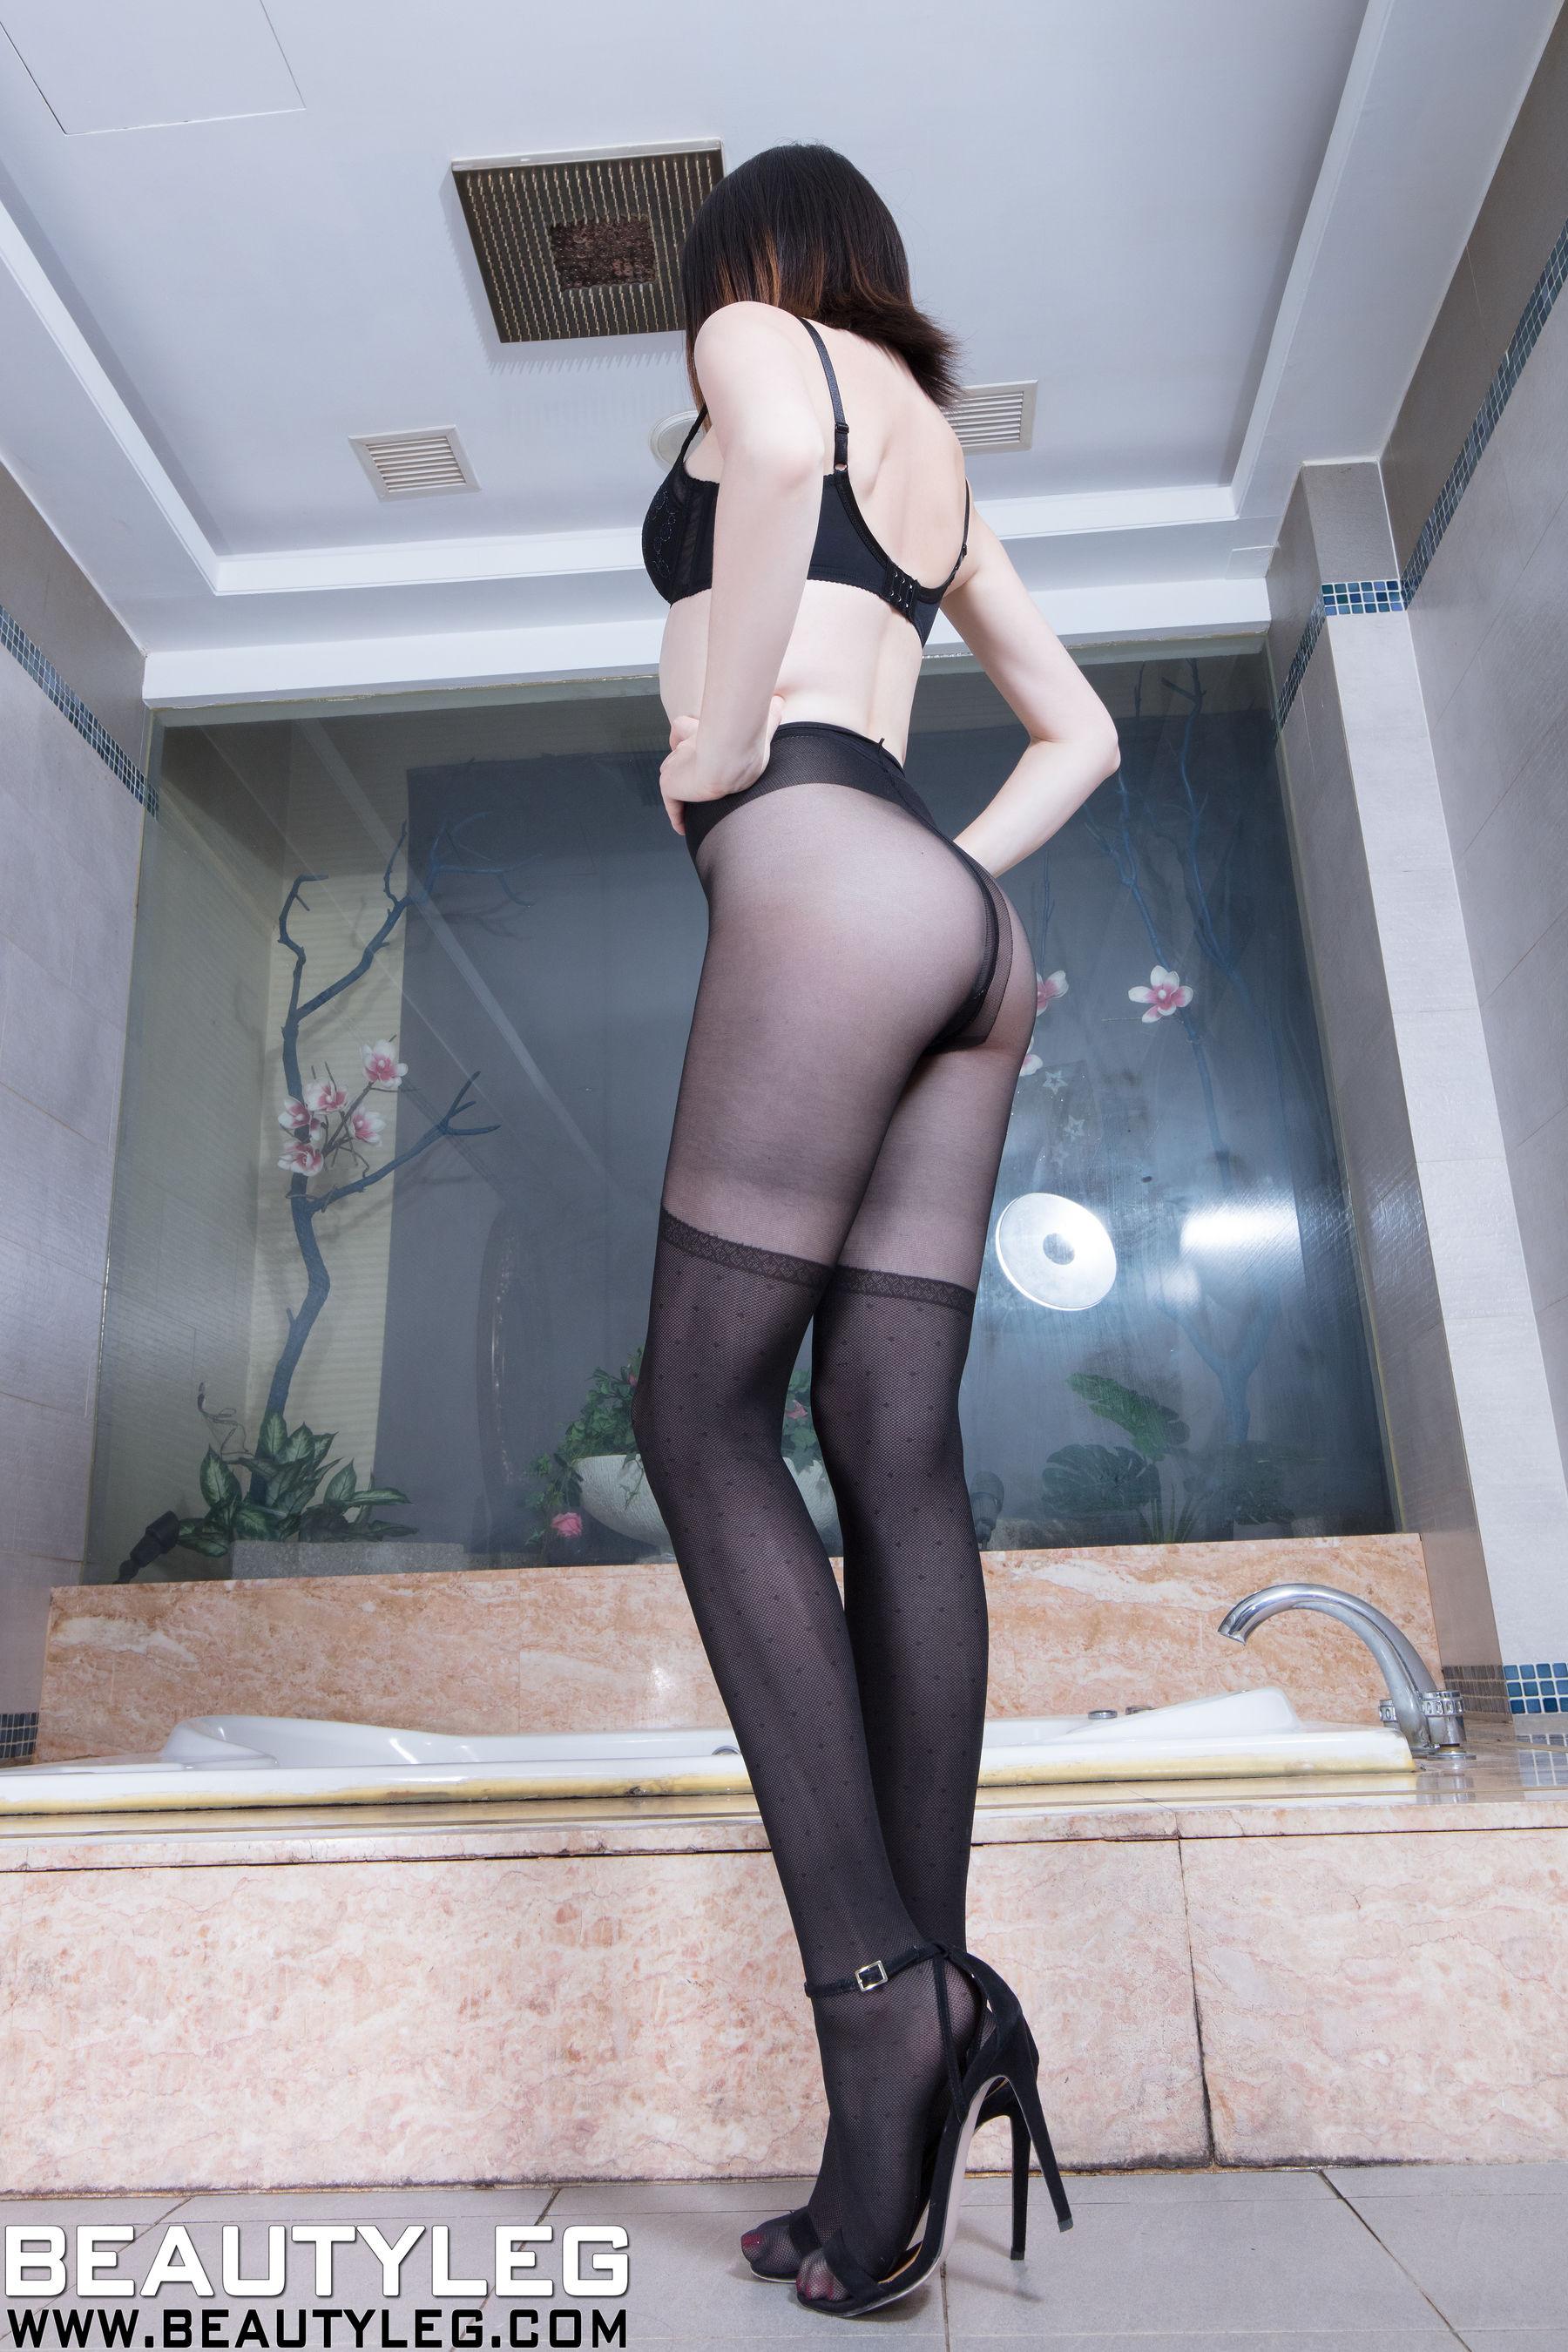 VOL.16 [Beautyleg]黑丝丝袜诱惑:腿模Anonymity超高清个人性感漂亮大图(23P)